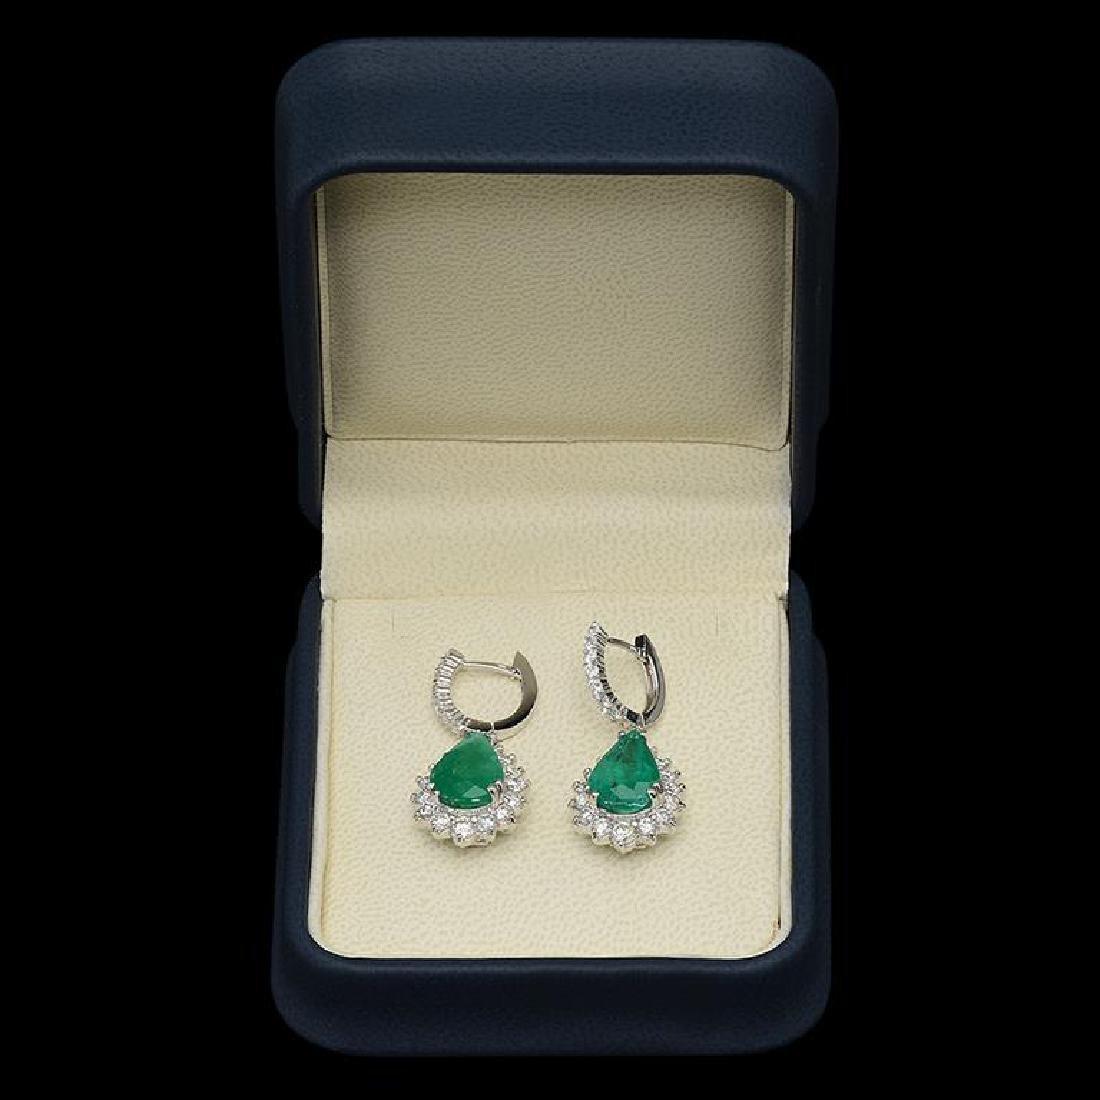 14K Gold 7.24ct Emerald & 2.51ct Diamond Earrings - 2